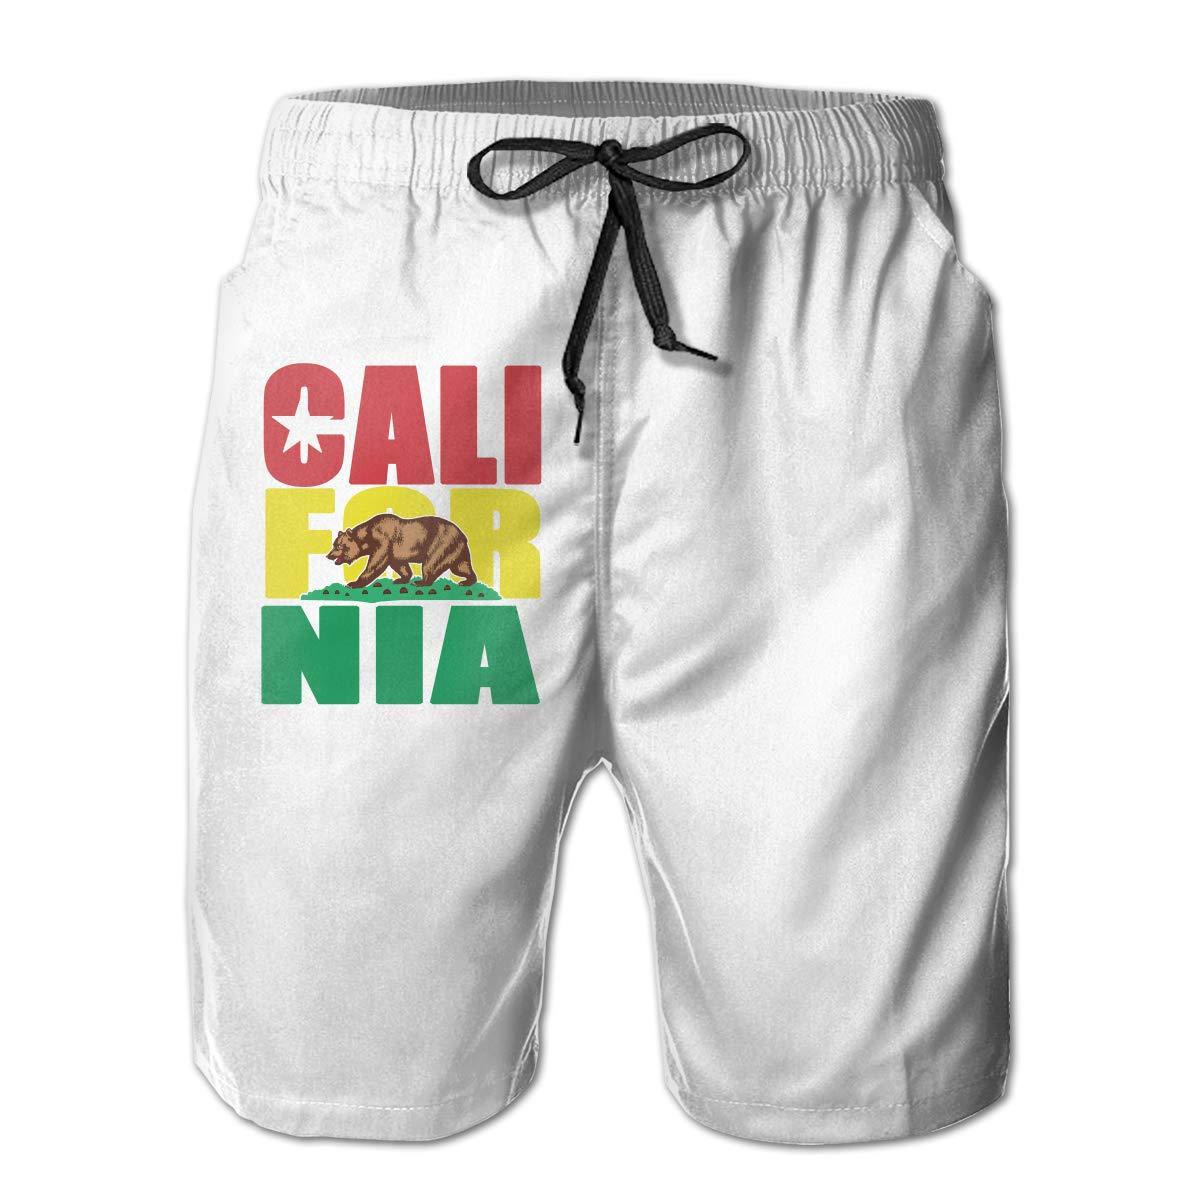 JF-X California Republic Mens Summer Beach Surf Board Shorts Quick Dry Swimming Trunks Casual Loose Sleep Short Pants